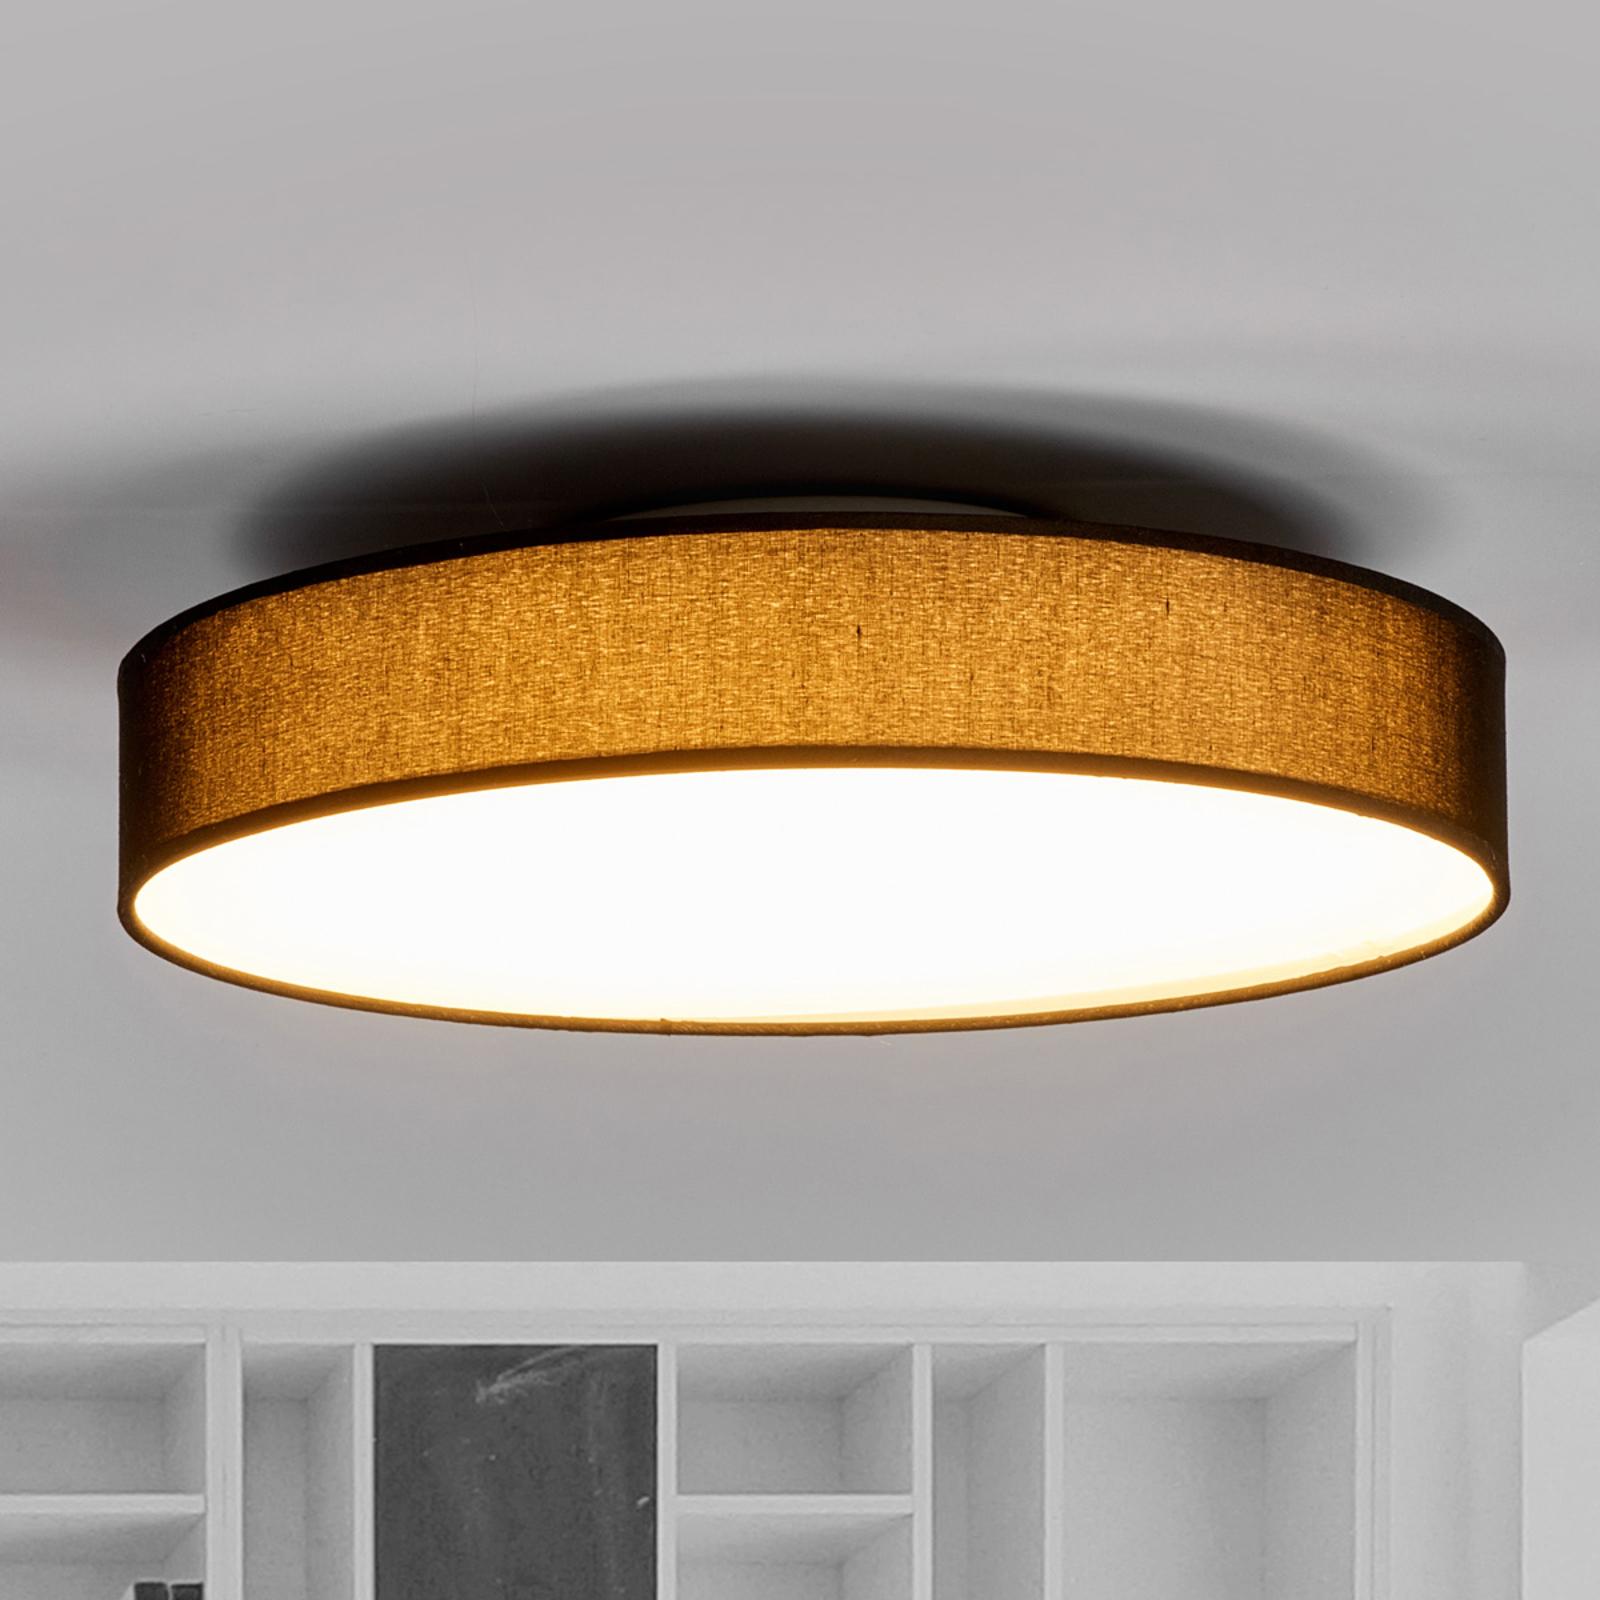 LED-stoff-taklampe Saira, 40 cm, svart